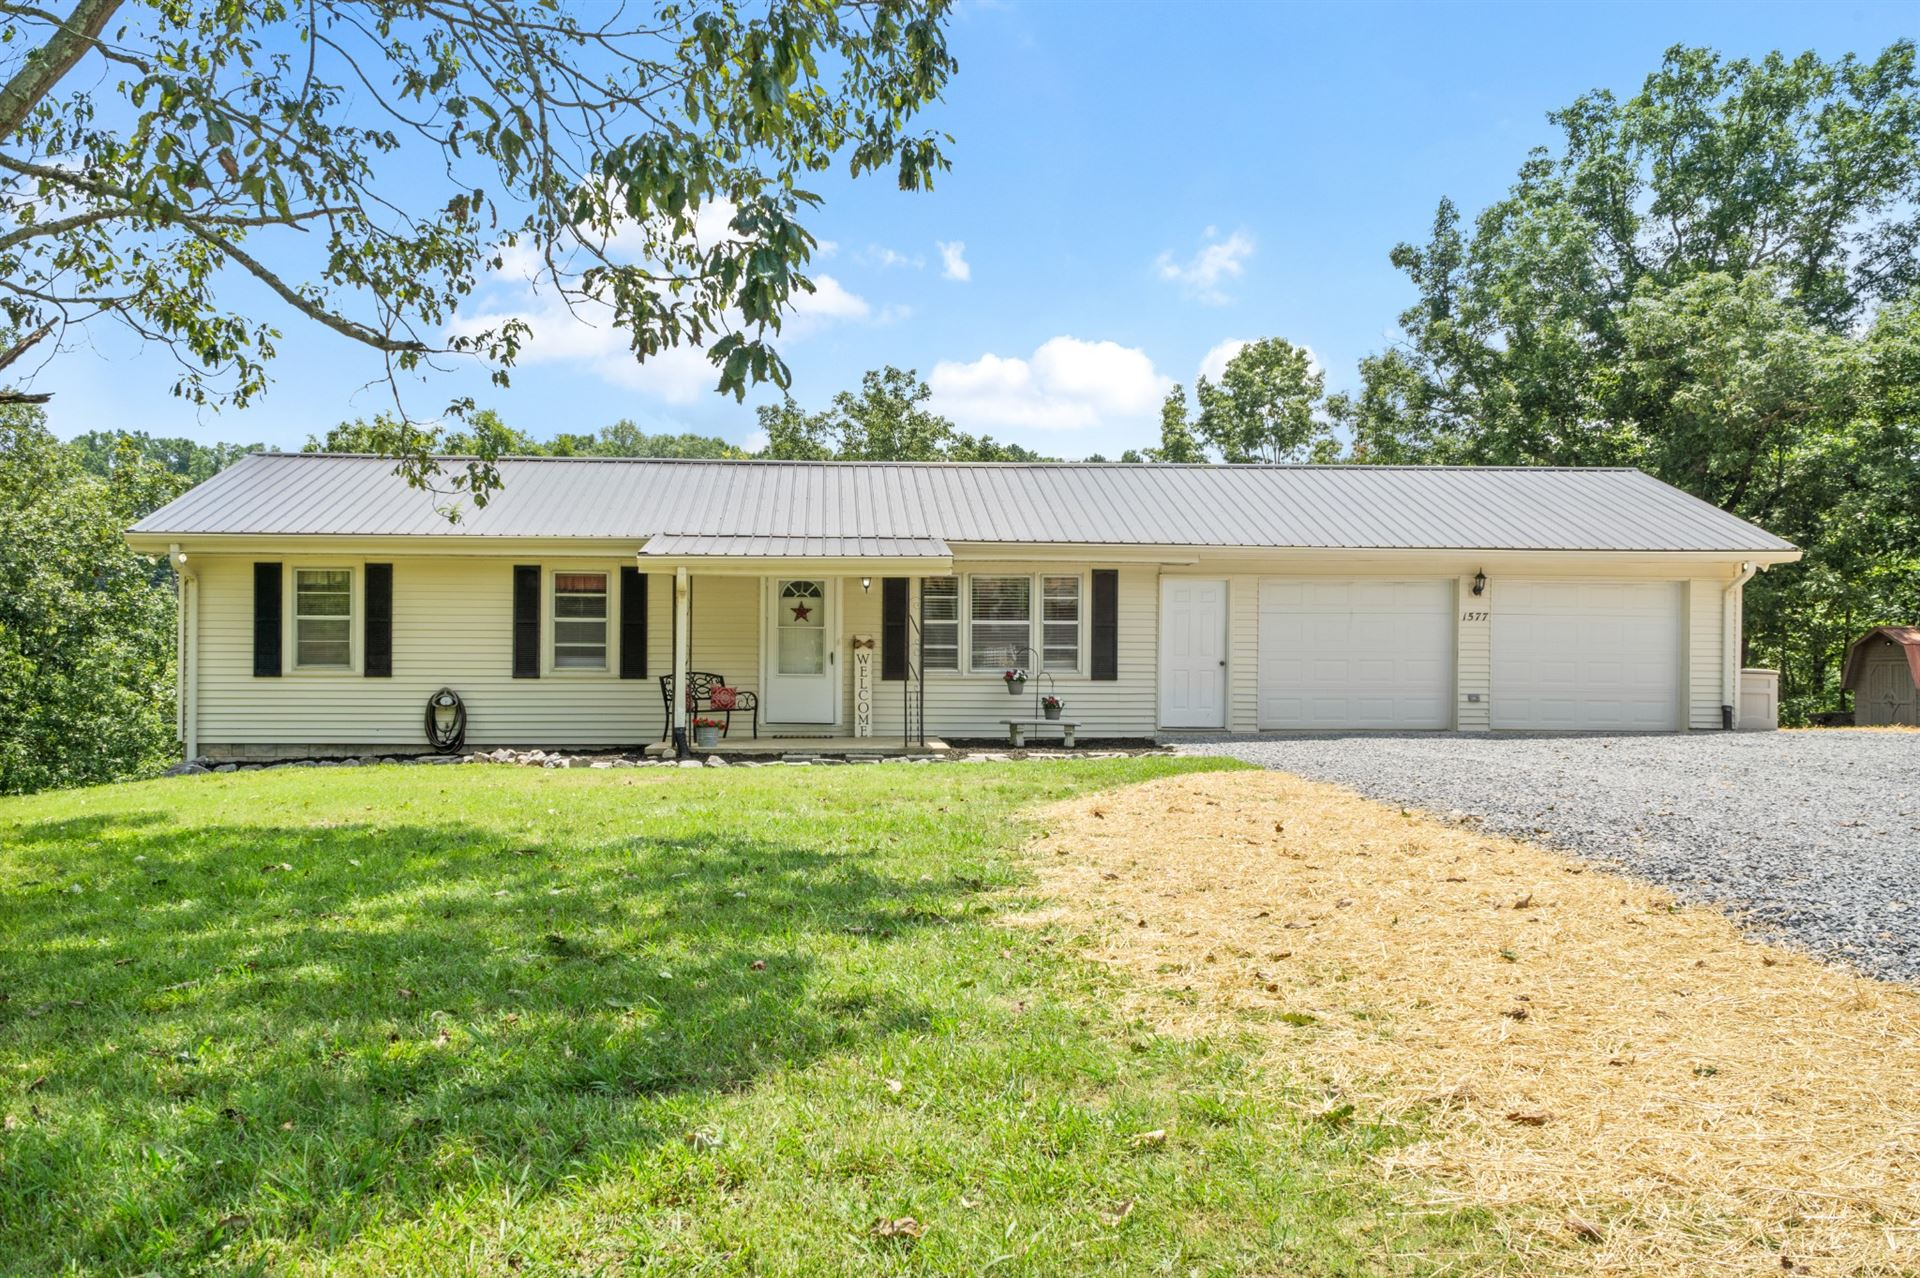 Photo of 1577 Mobley Ln, Erin, TN 37061 (MLS # 2167663)